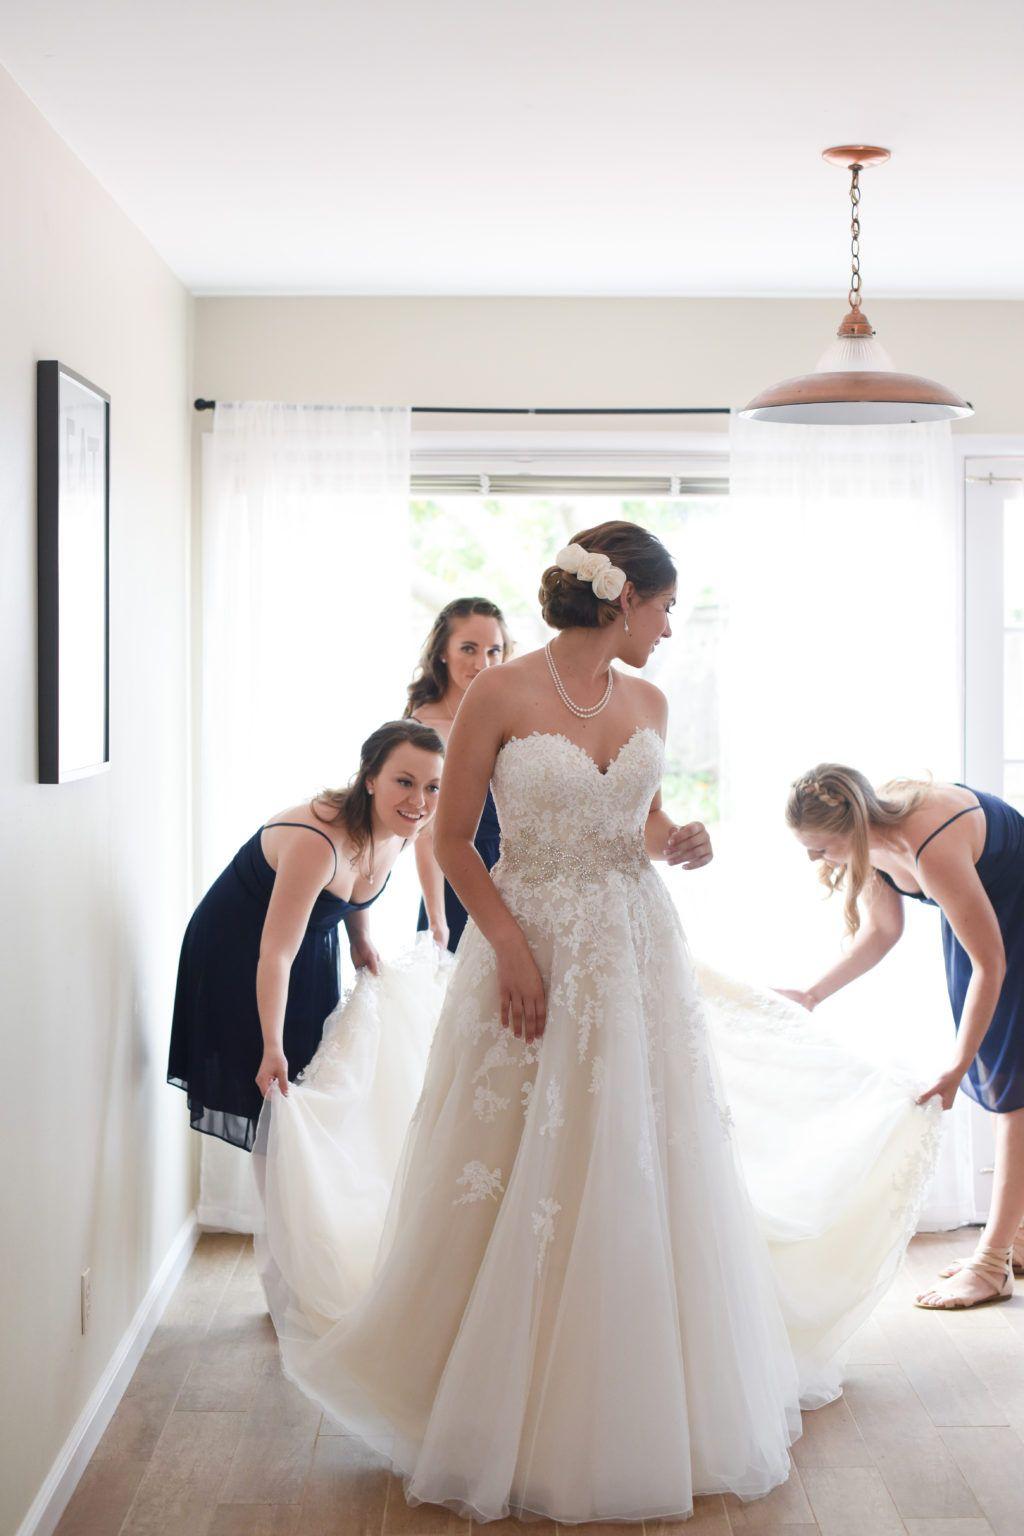 Chancey Charm Wedding Planning And Design Wedding Planner Wedding Coordinator San Diego Wedding Plan Bridal Ball Gown Sweetheart Bridal Wedding Dresses